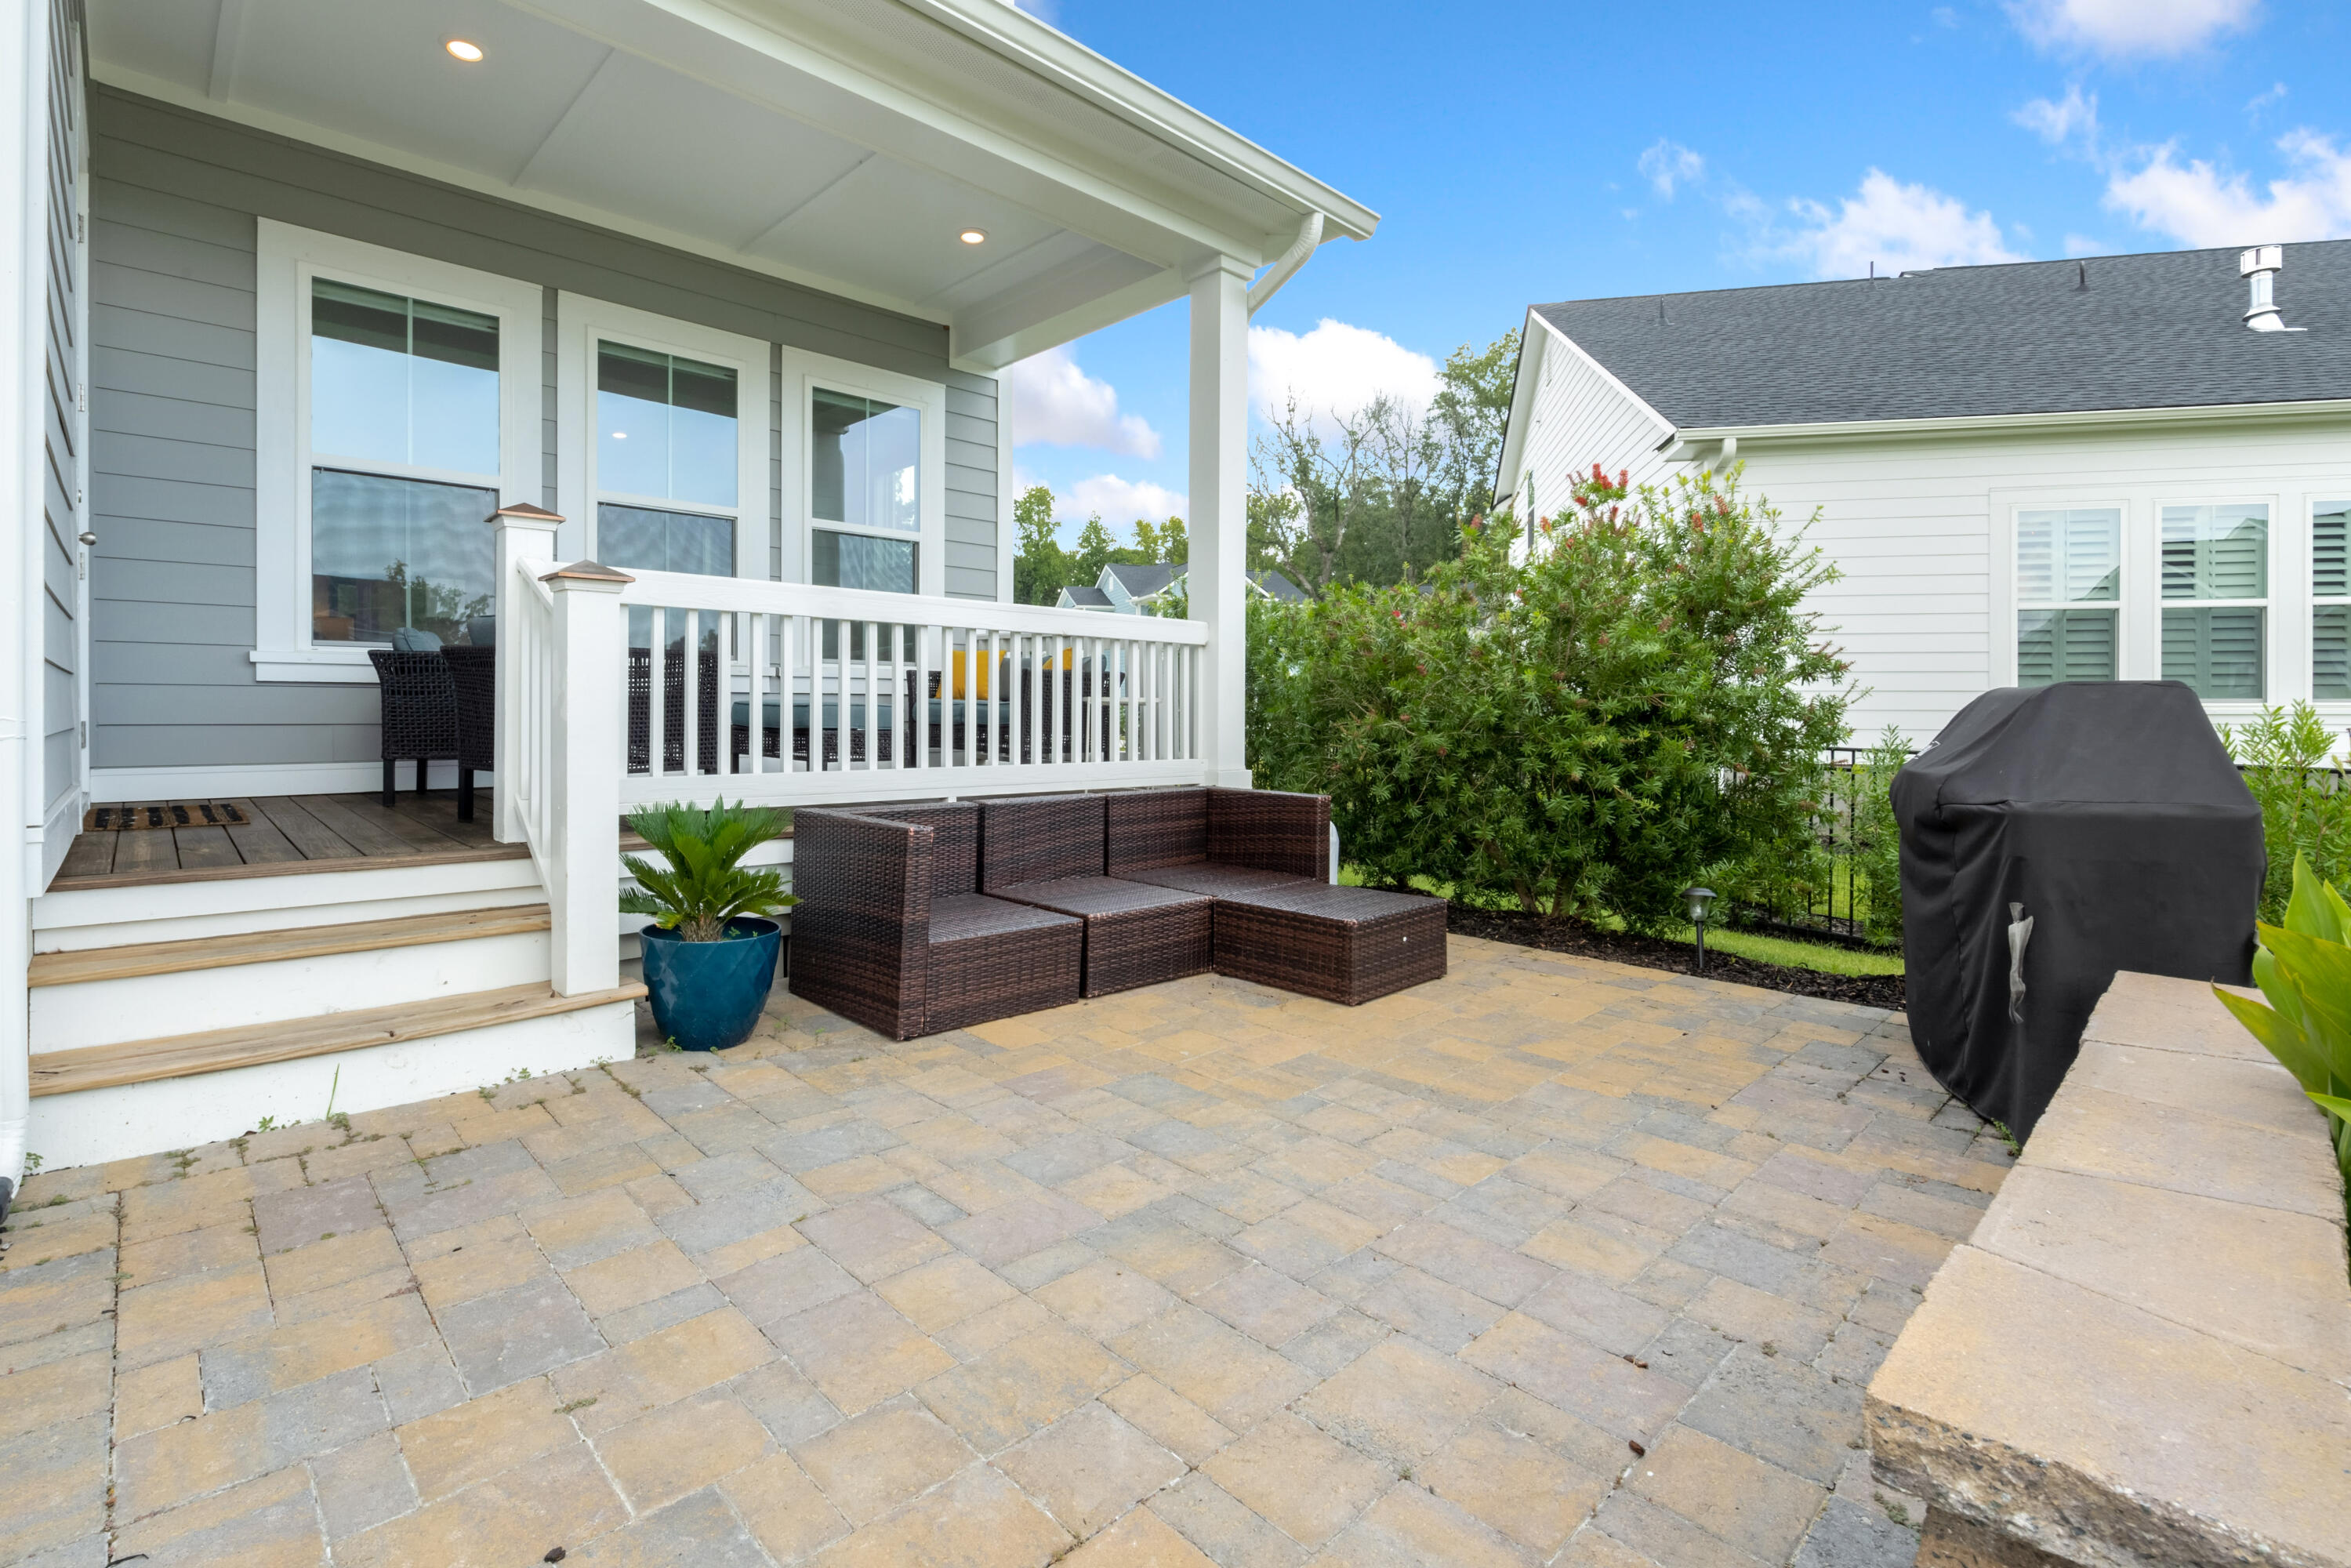 Carolina Park Homes For Sale - 3856 Maidstone, Mount Pleasant, SC - 15